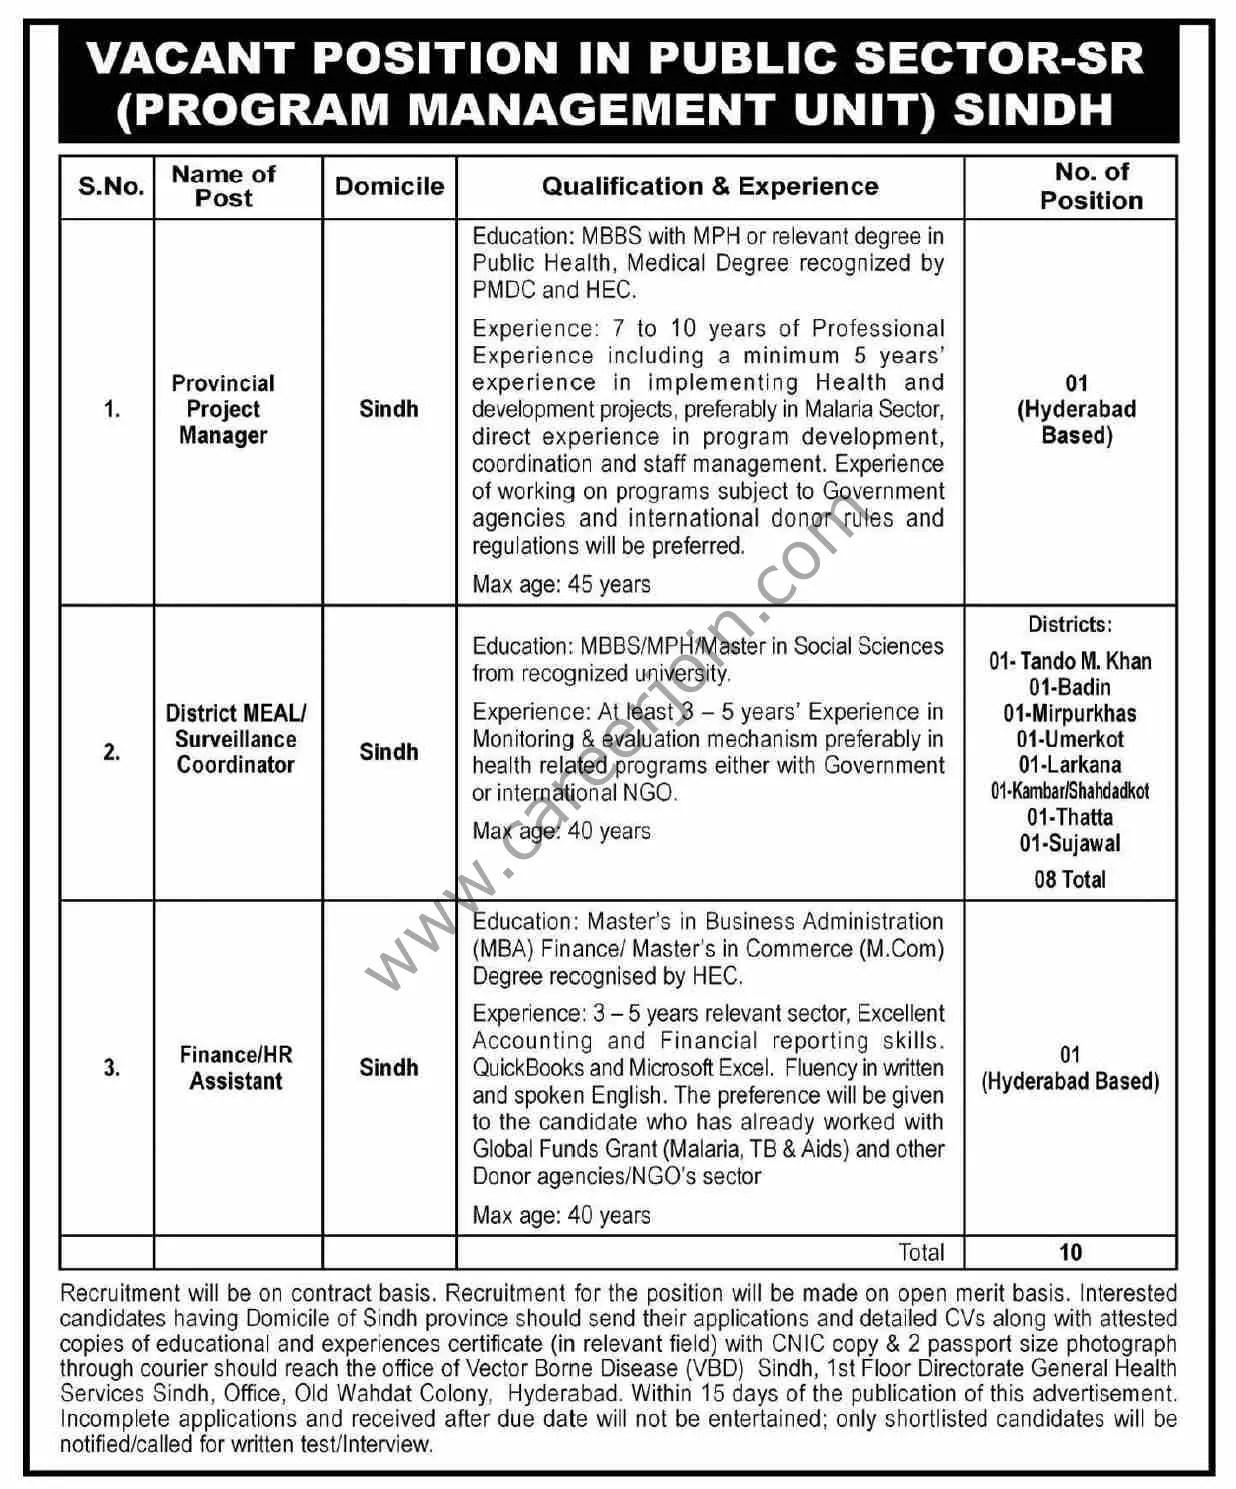 Public Sector Program Management Unit Jobs June 2021